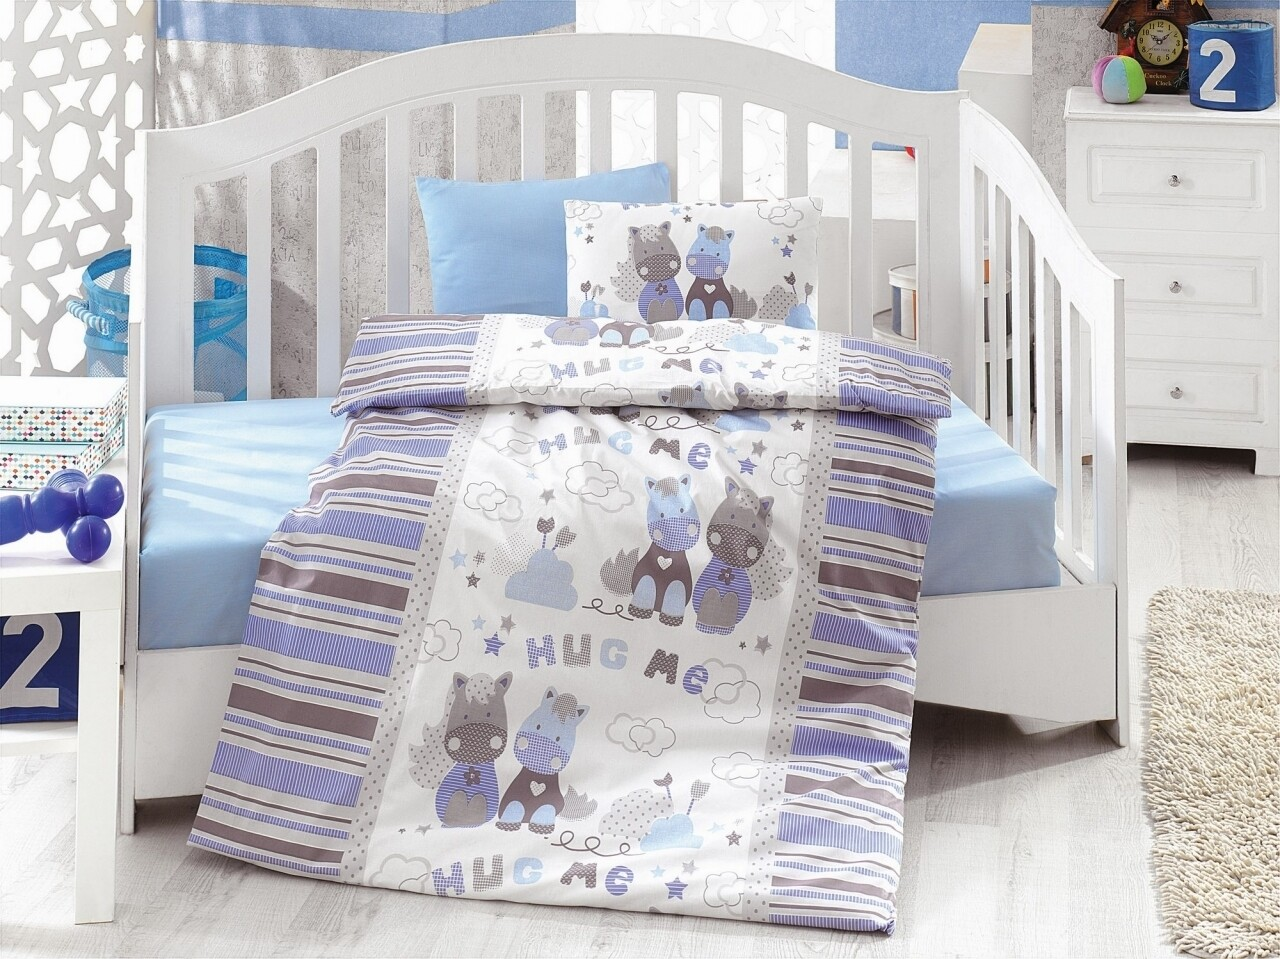 Lenjerie de pat pentru copii, 4 piese, 100% bumbac ranforce, Cotton Box, Hug me